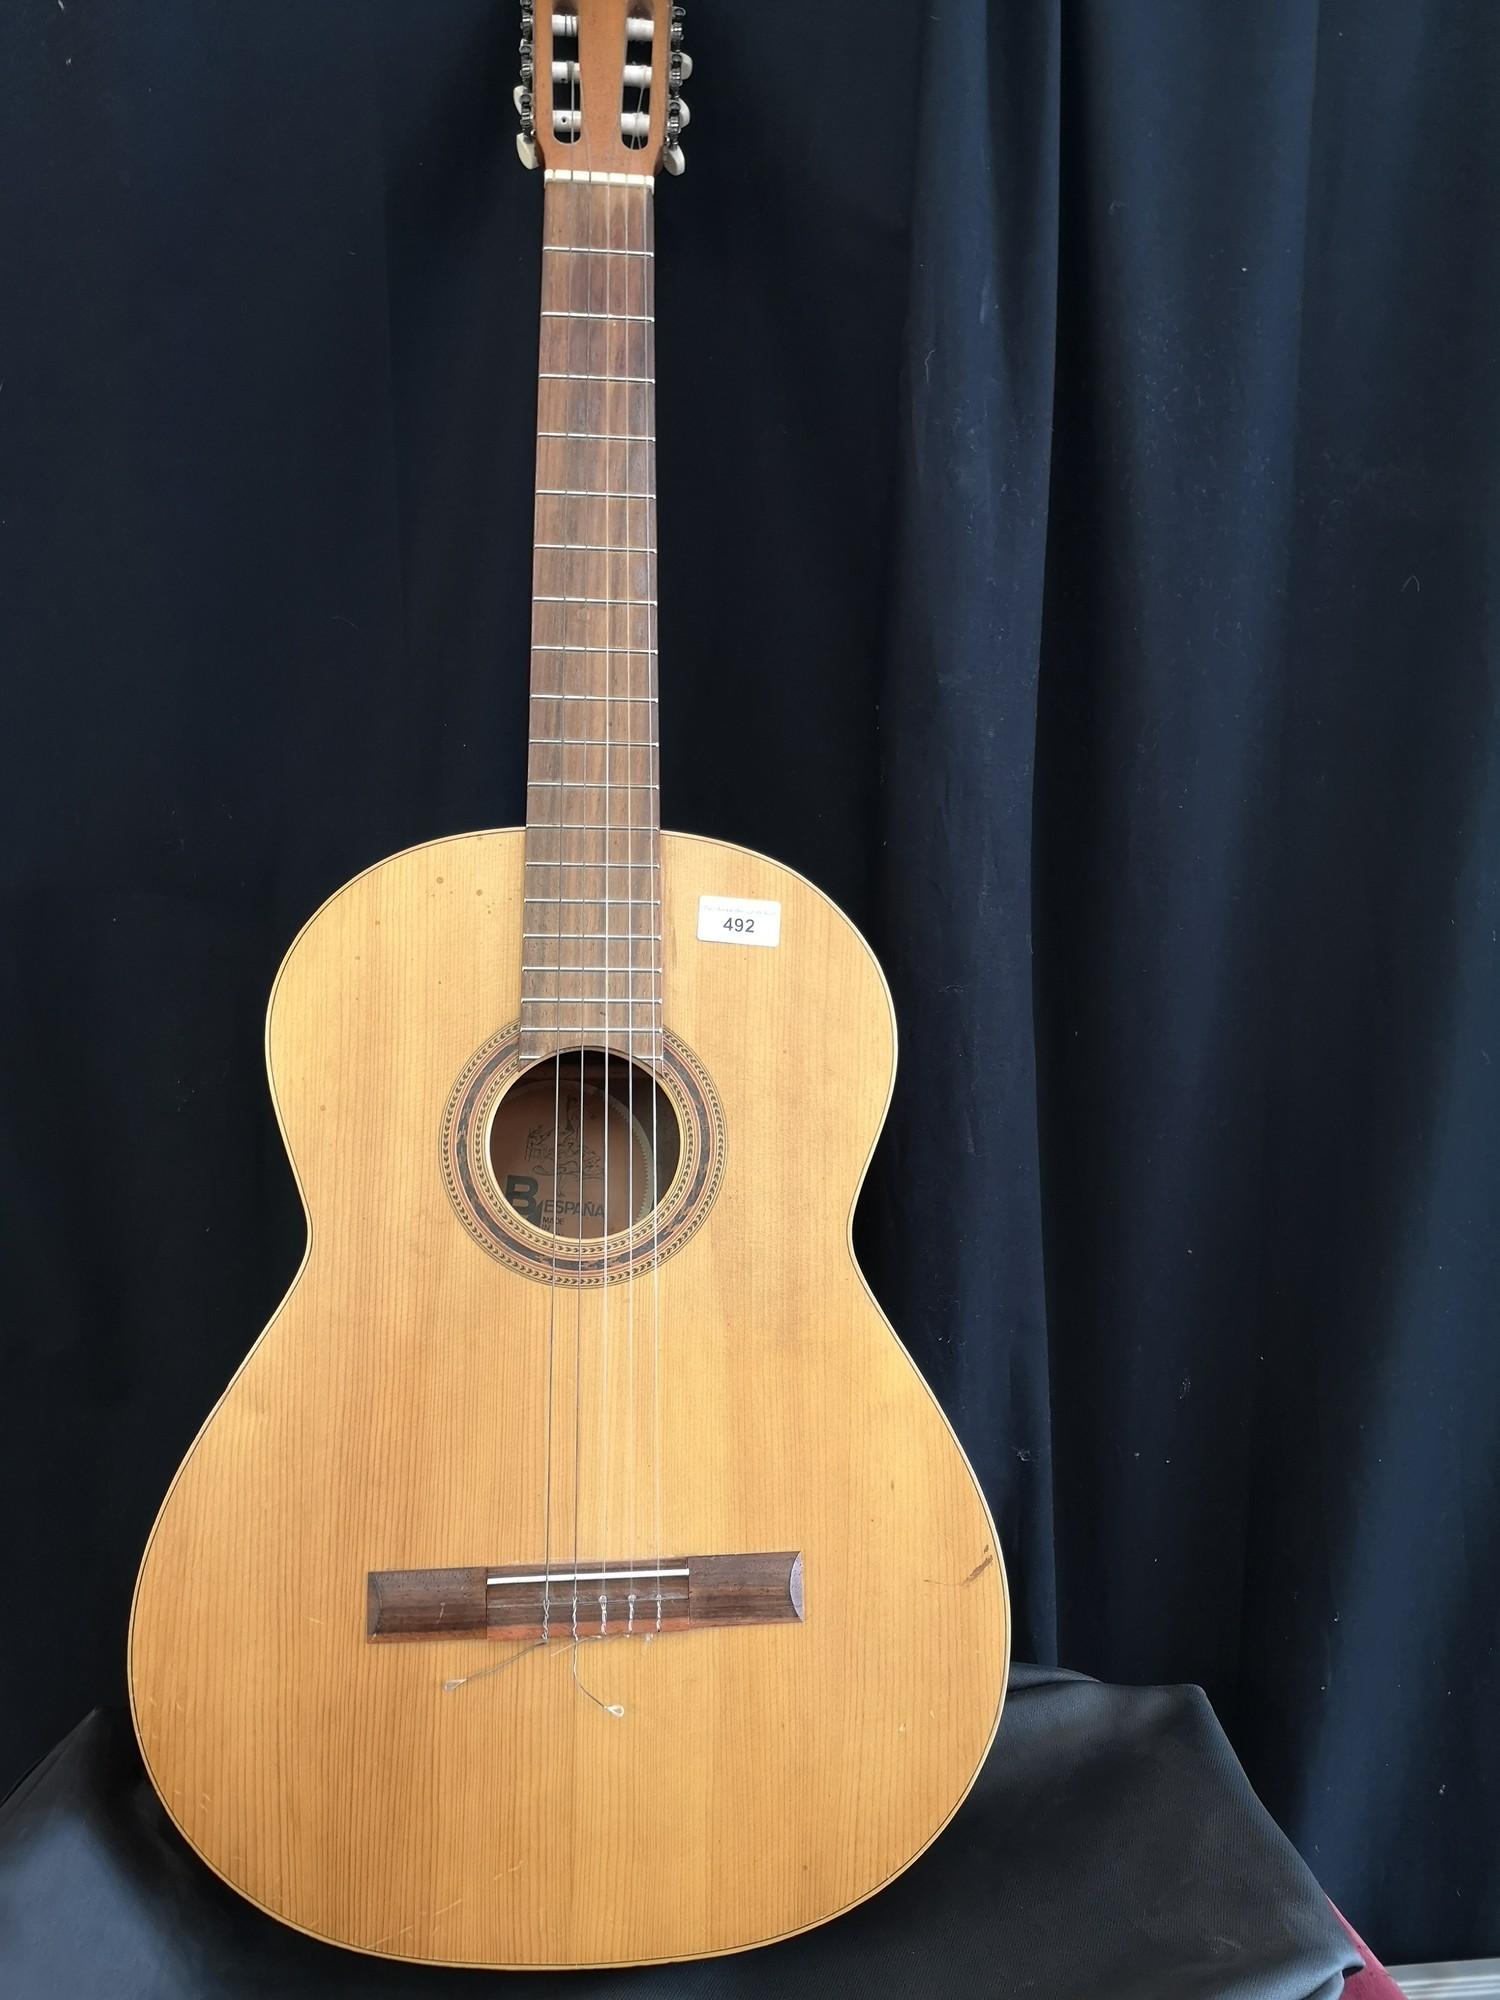 Bespania acoustic guitar.